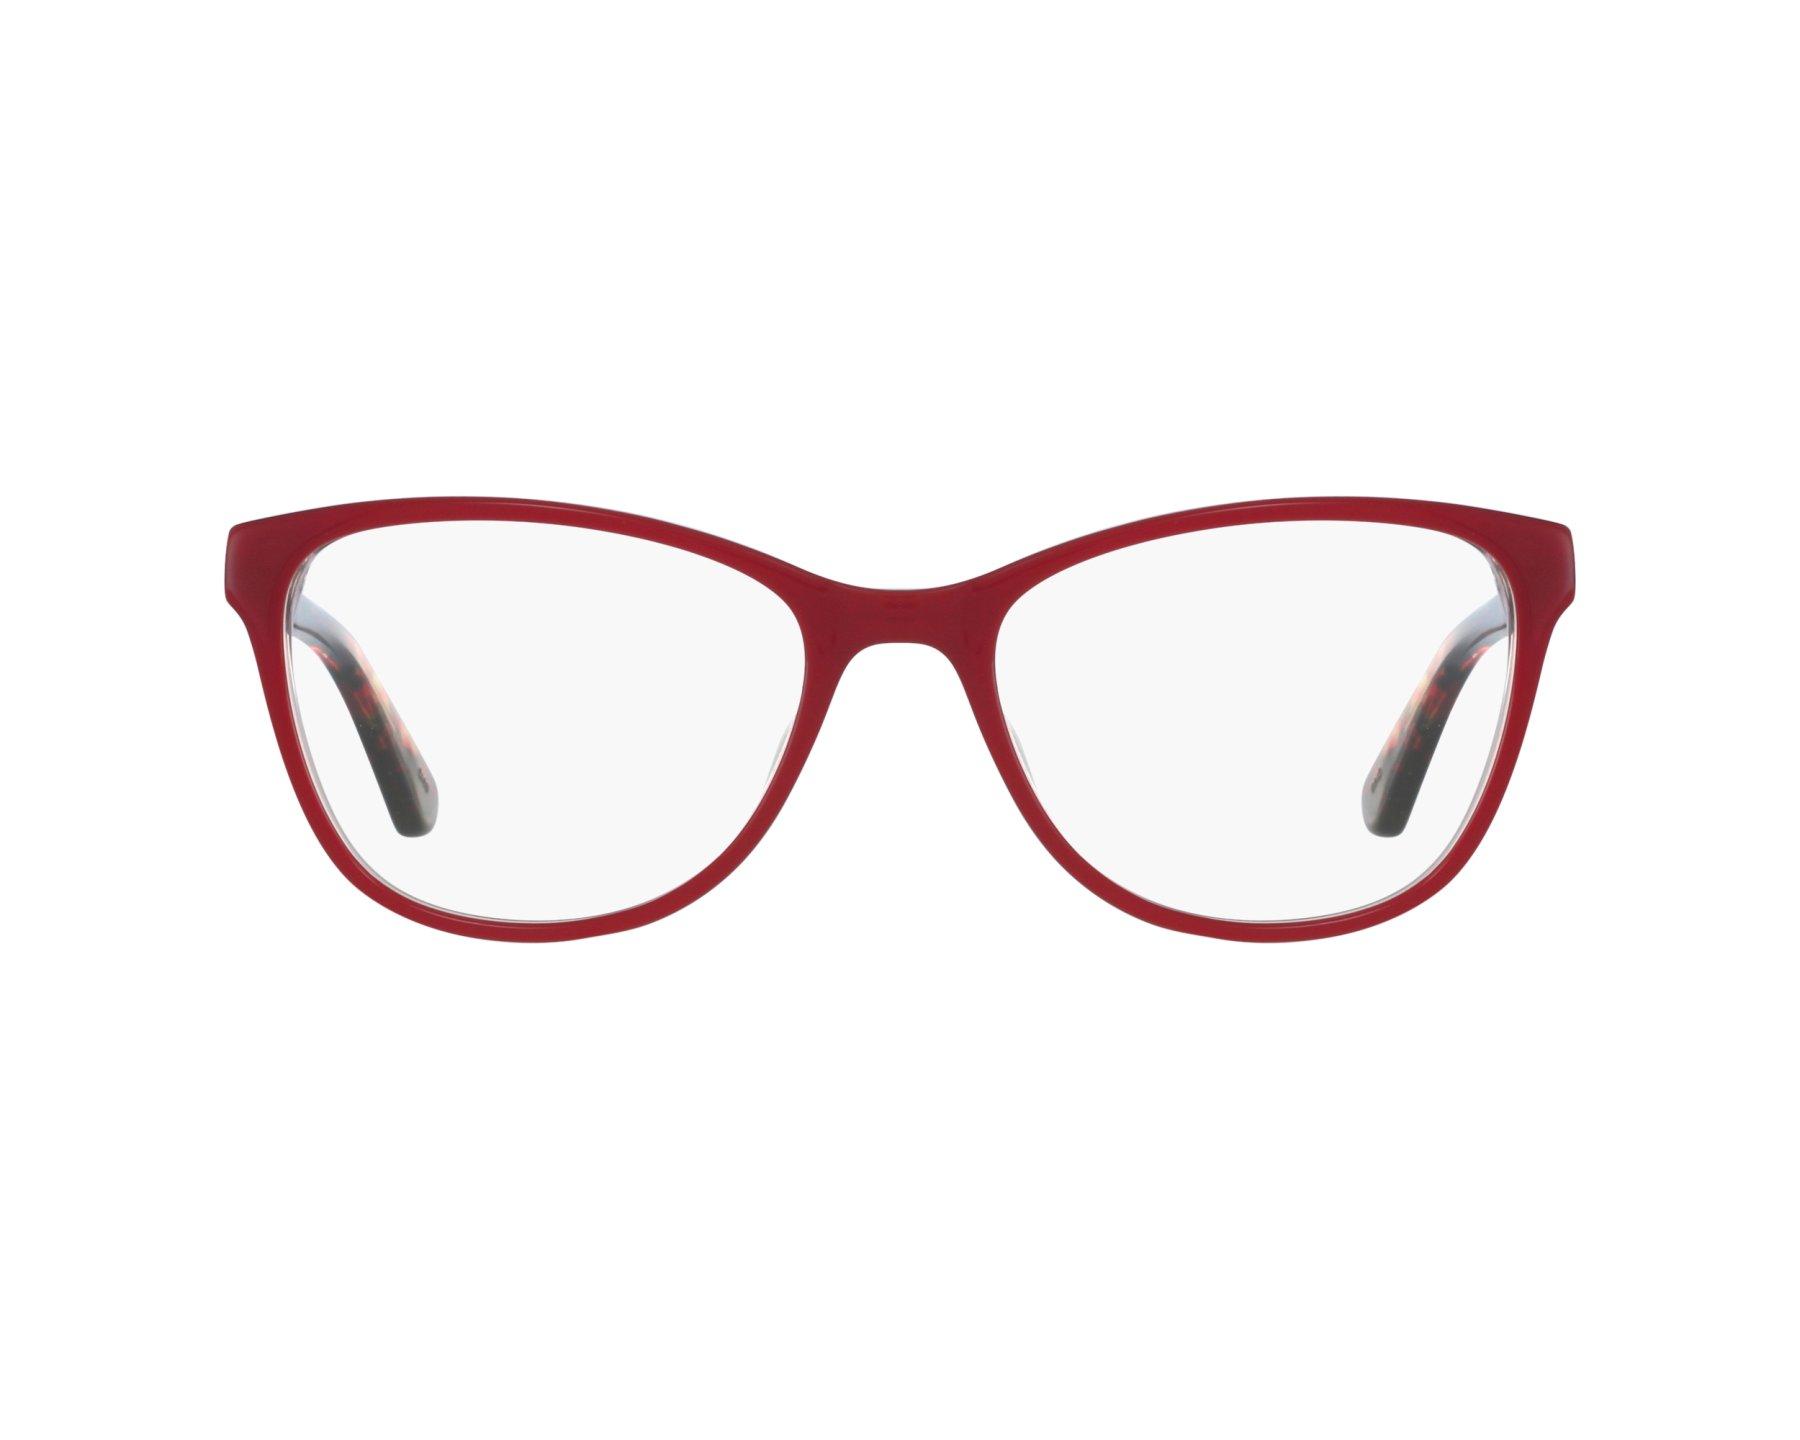 Guess Eyeglasses GU-2547 068 Red | visio-net.com